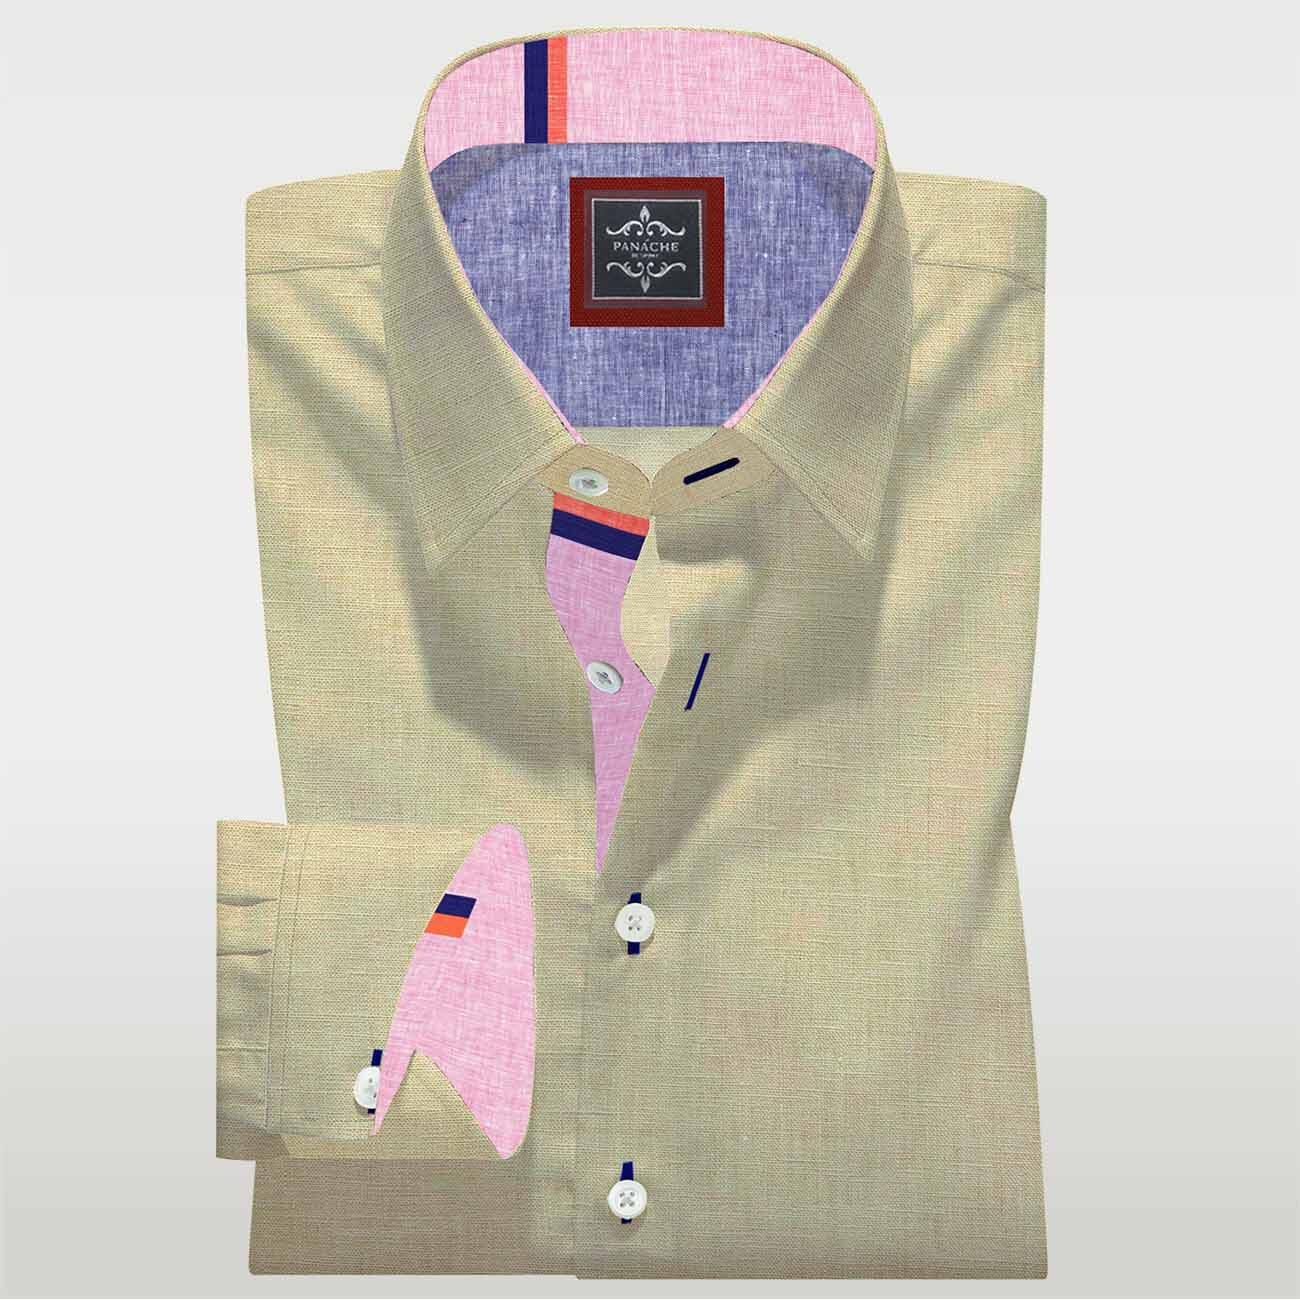 Luxury Beige Linen Shirt